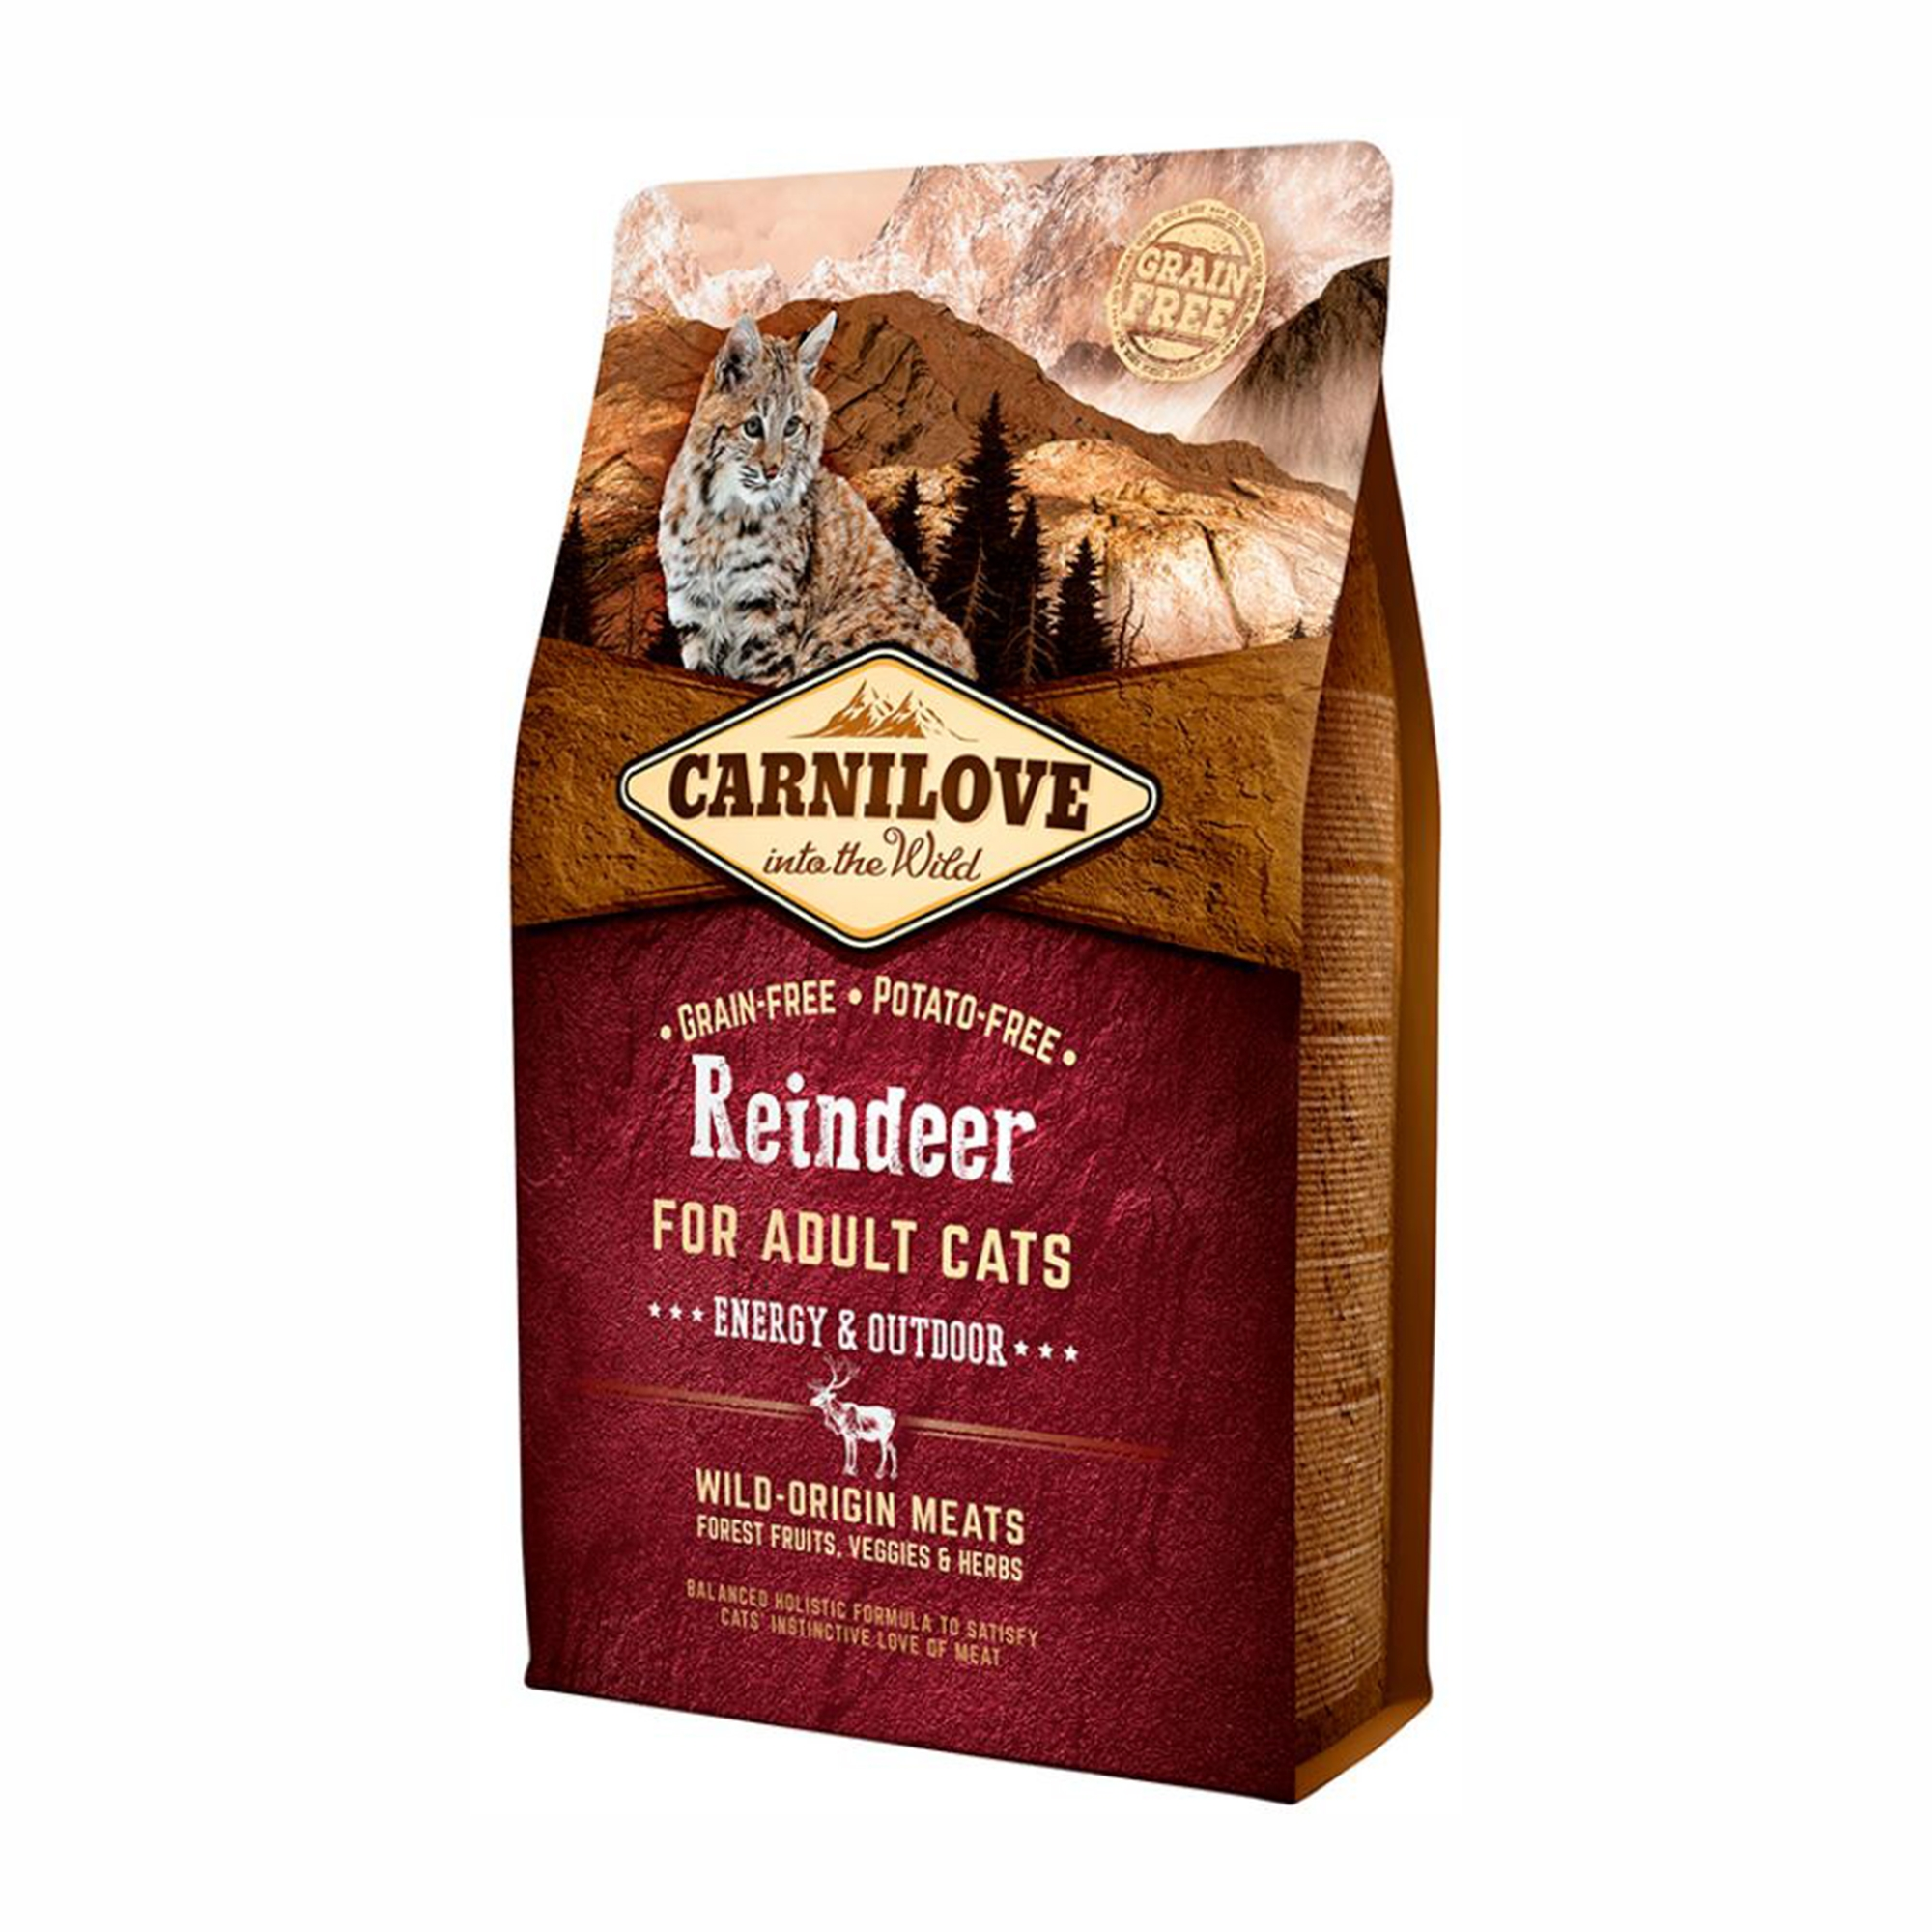 Carnilove Reindeer Cats Energy & Outdoor, 2 kg imagine